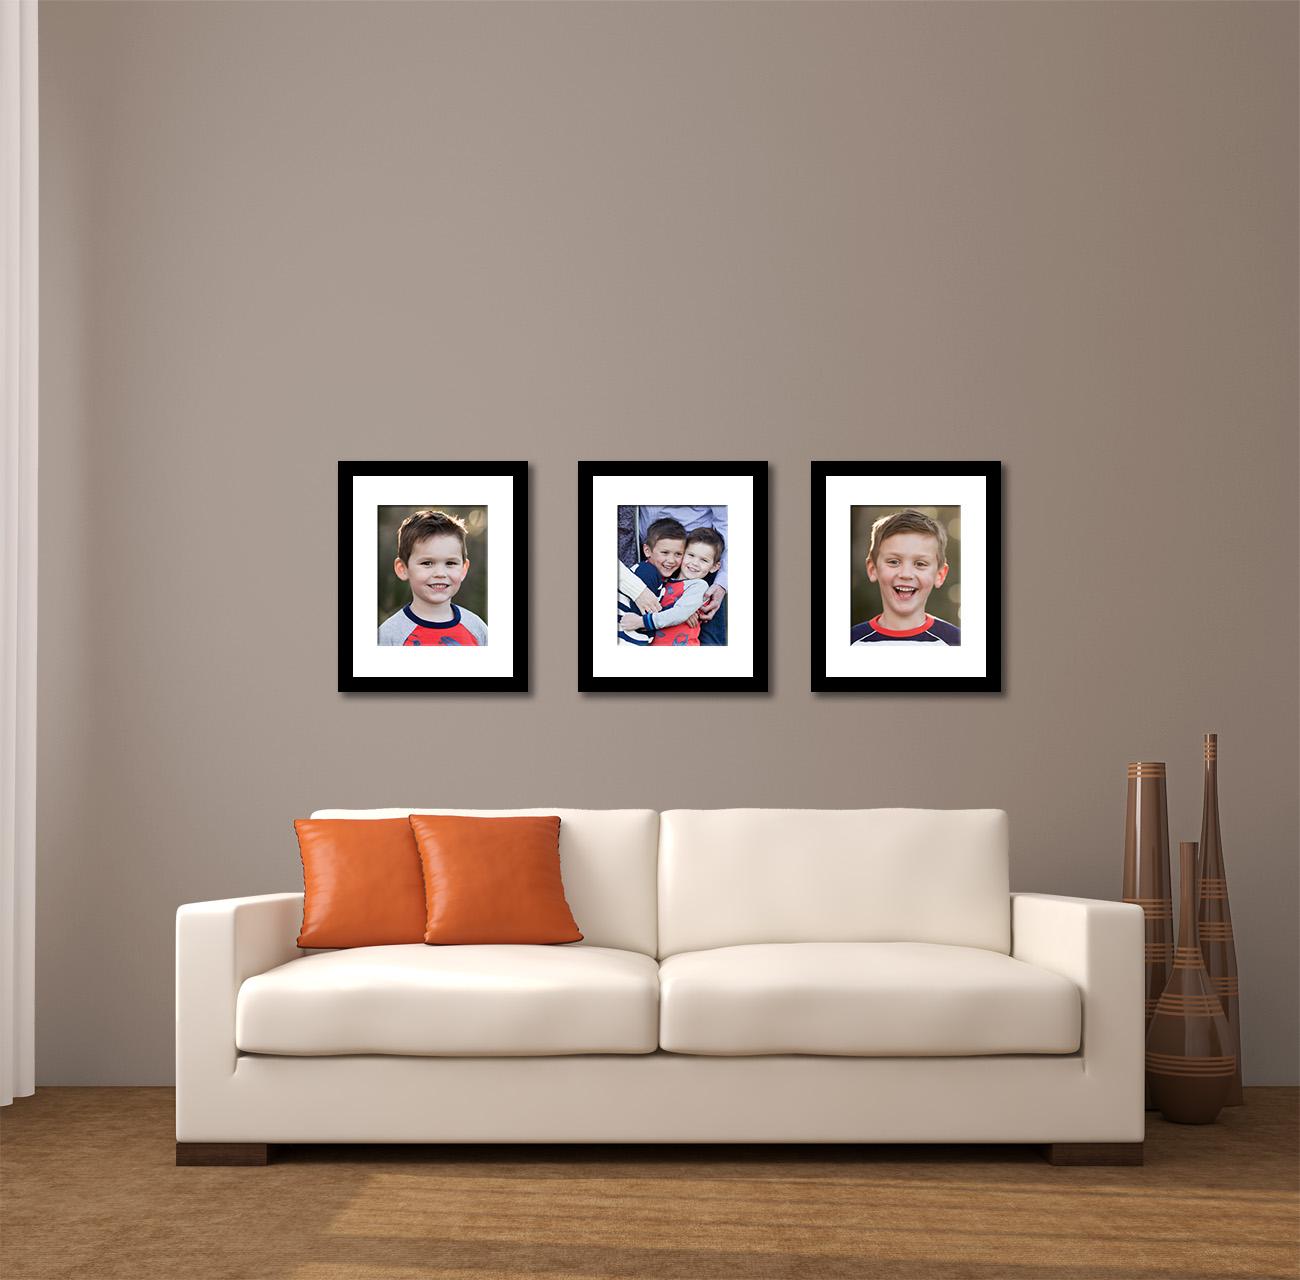 (3) 11x14 prints mounted to 16x20